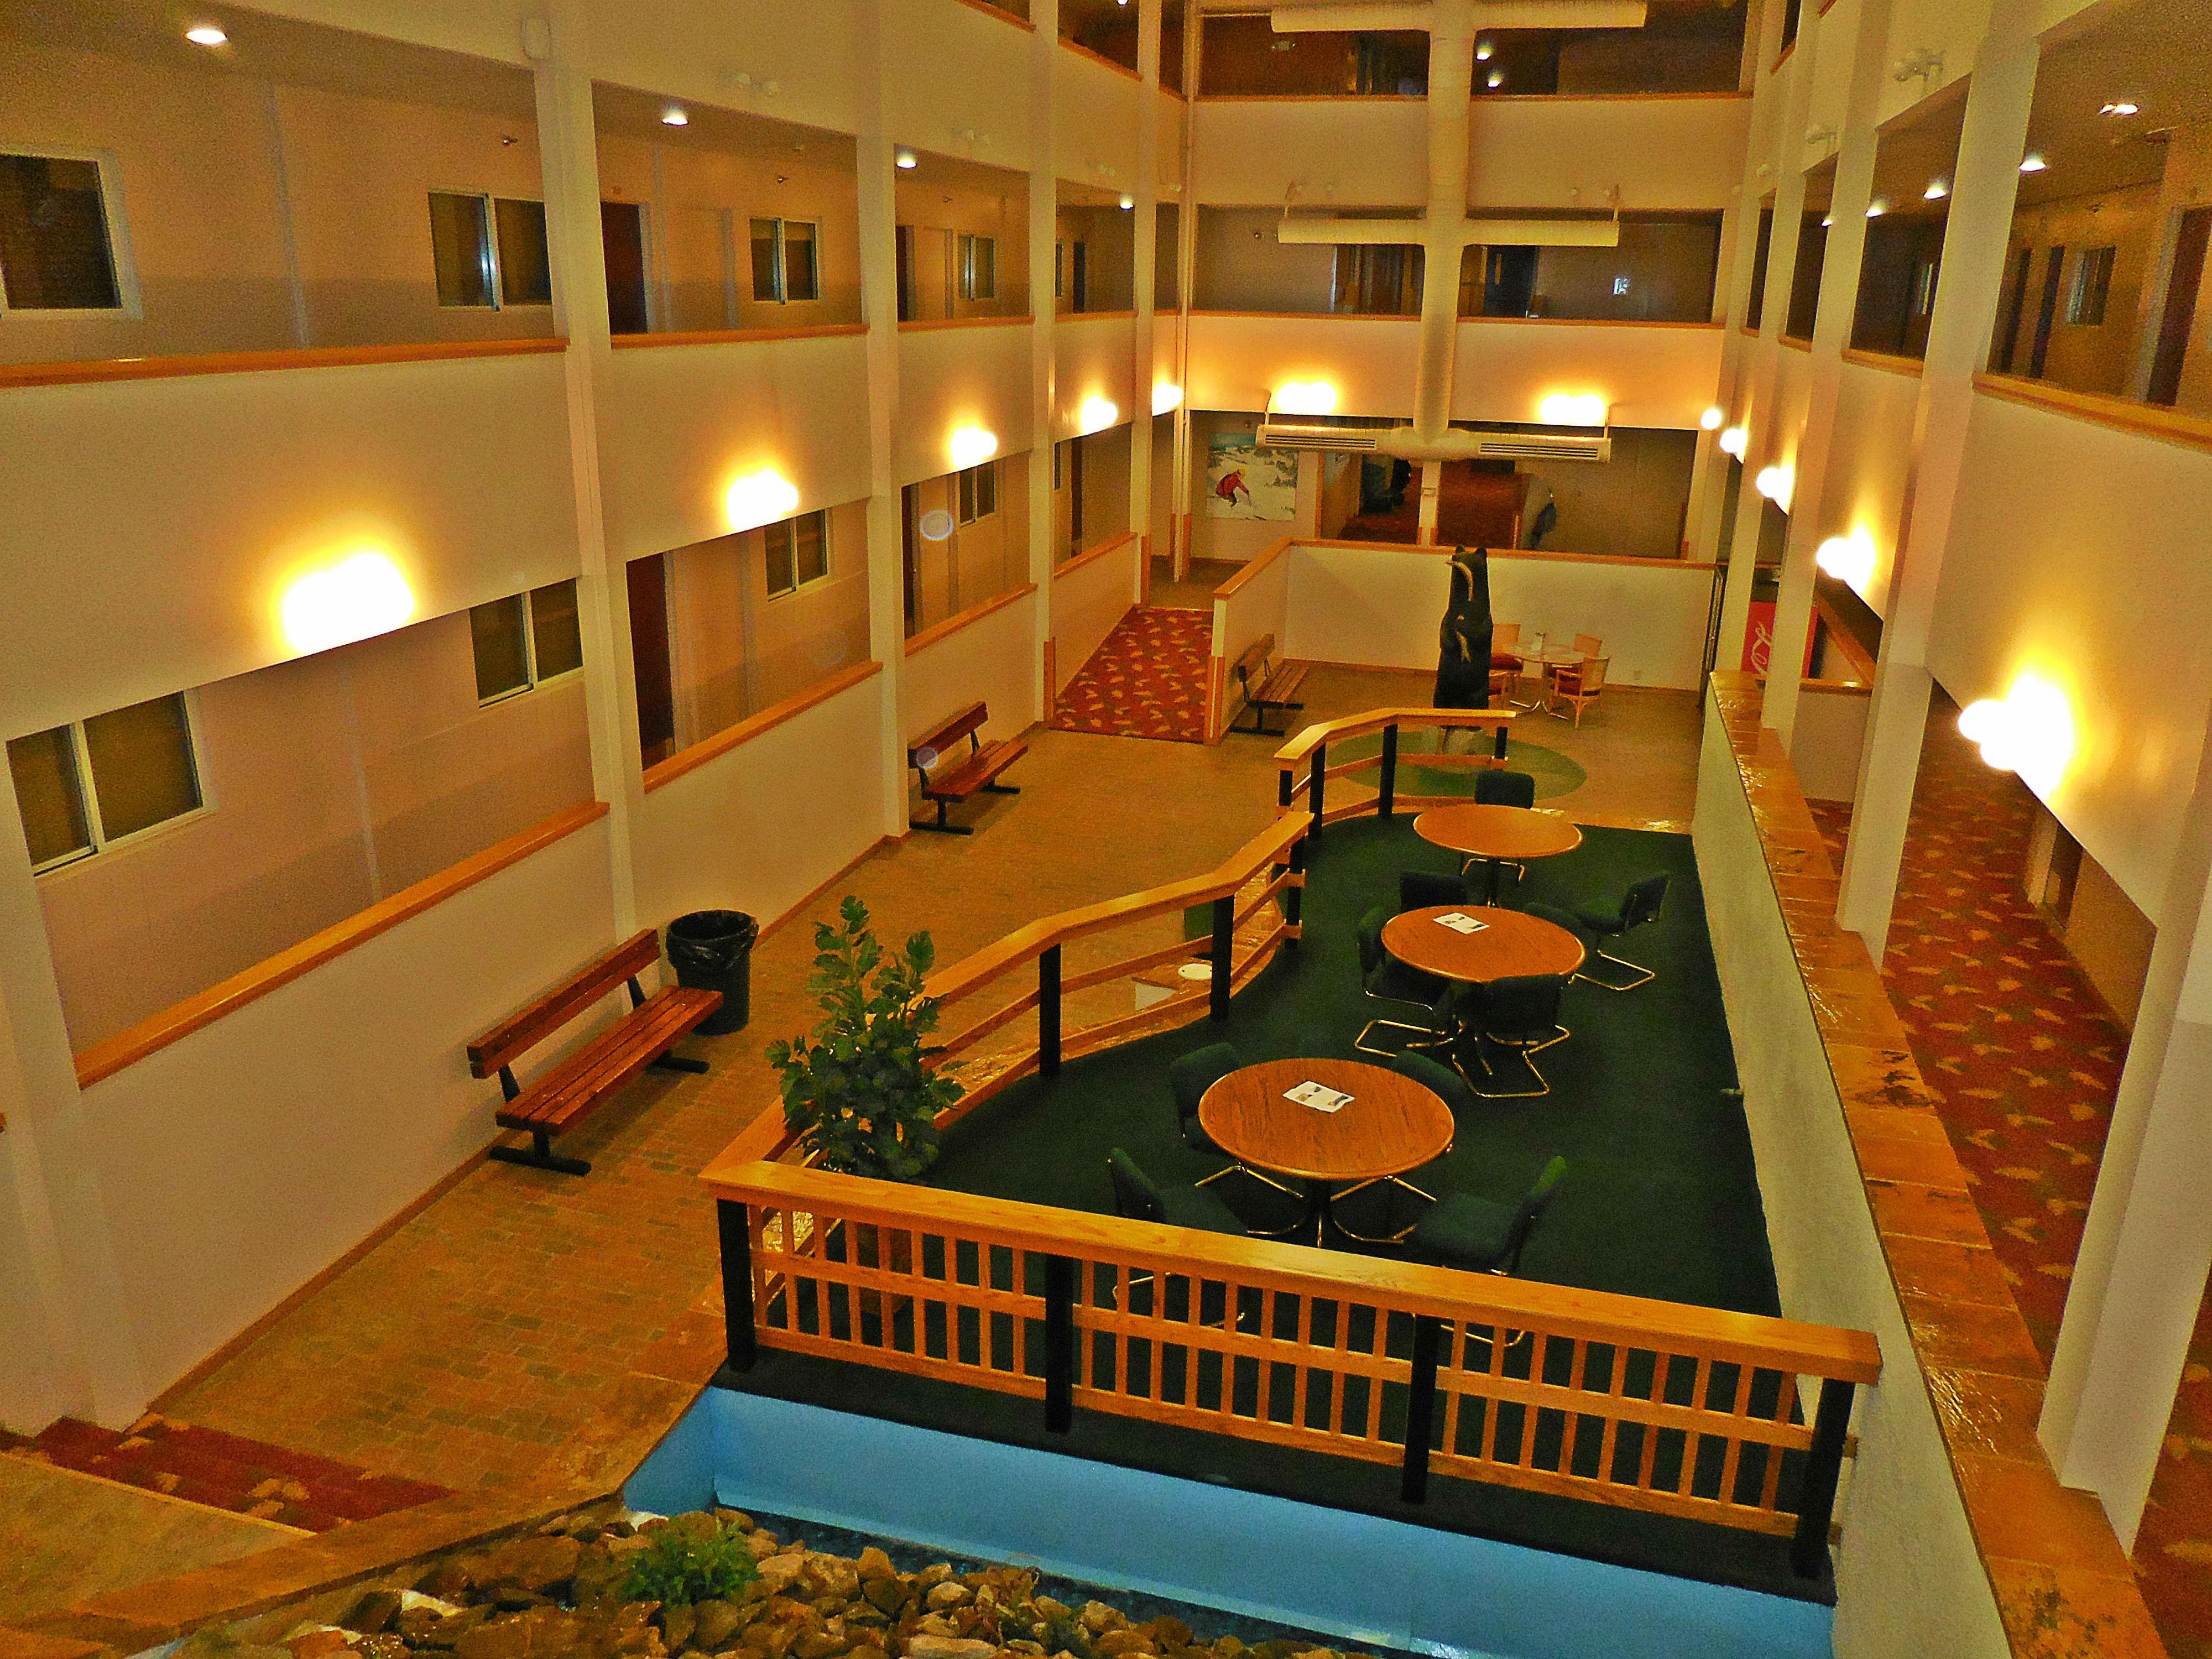 Enjoy Mountain Lodge's many common areas and atriums - spacious!